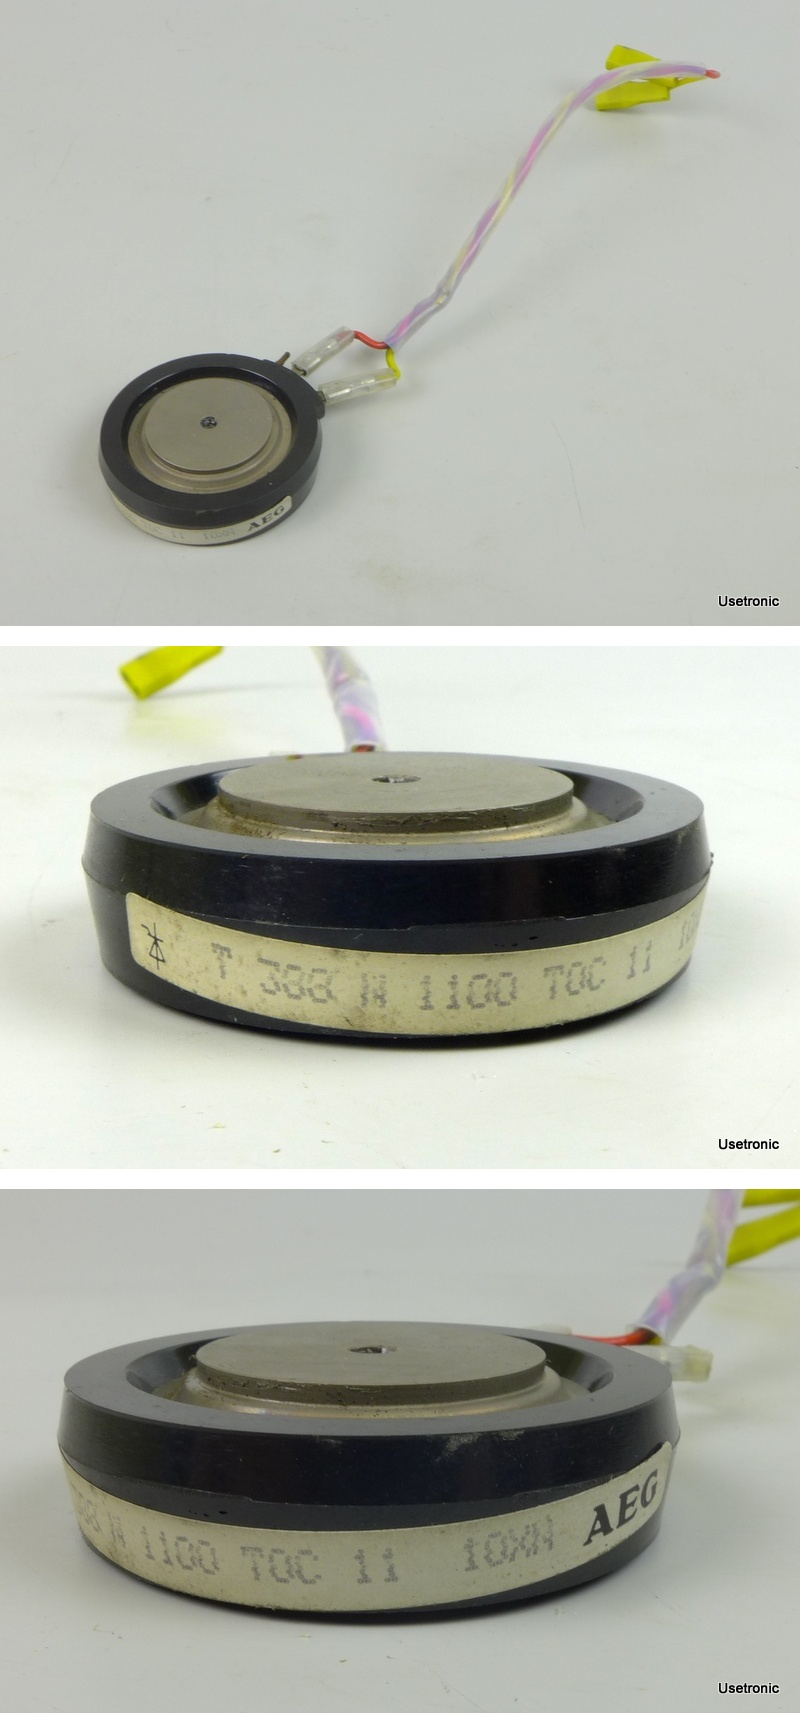 AEG Minisemi-D 029.132 304 KW Thyristor AEG T388 N1100 TOC 11 029.062